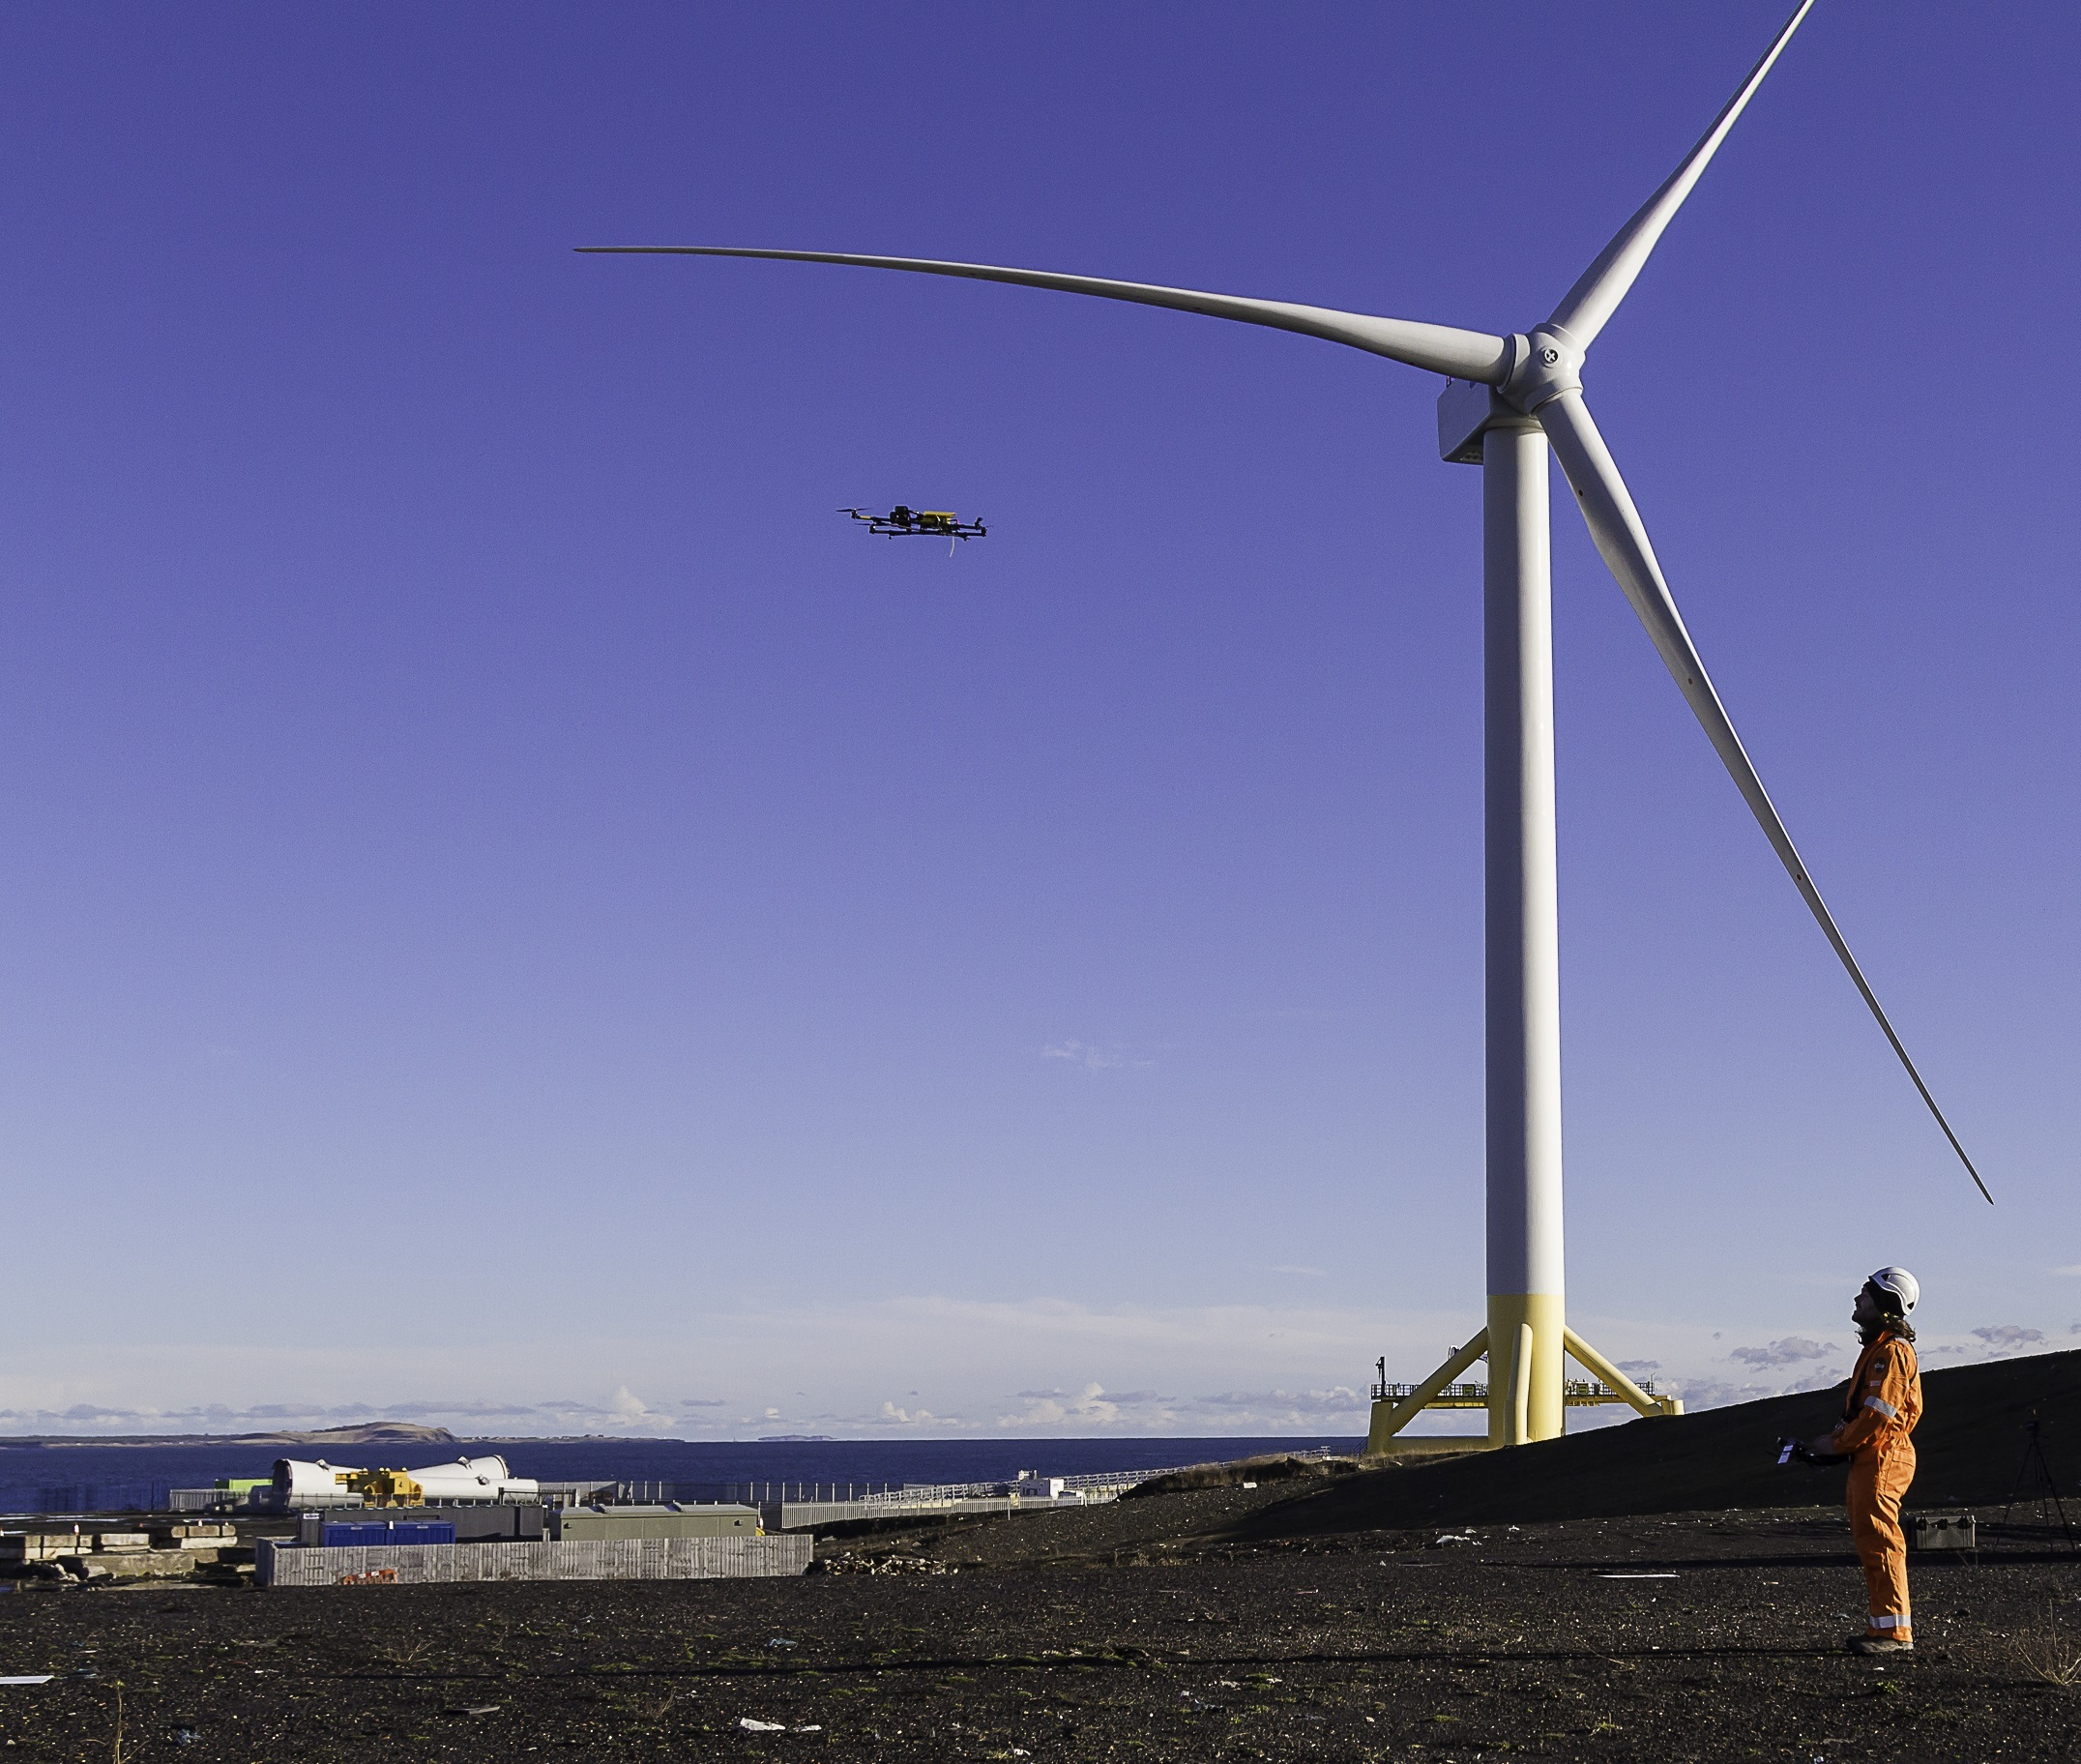 SgurrEnergy UAV with wind turbine generator